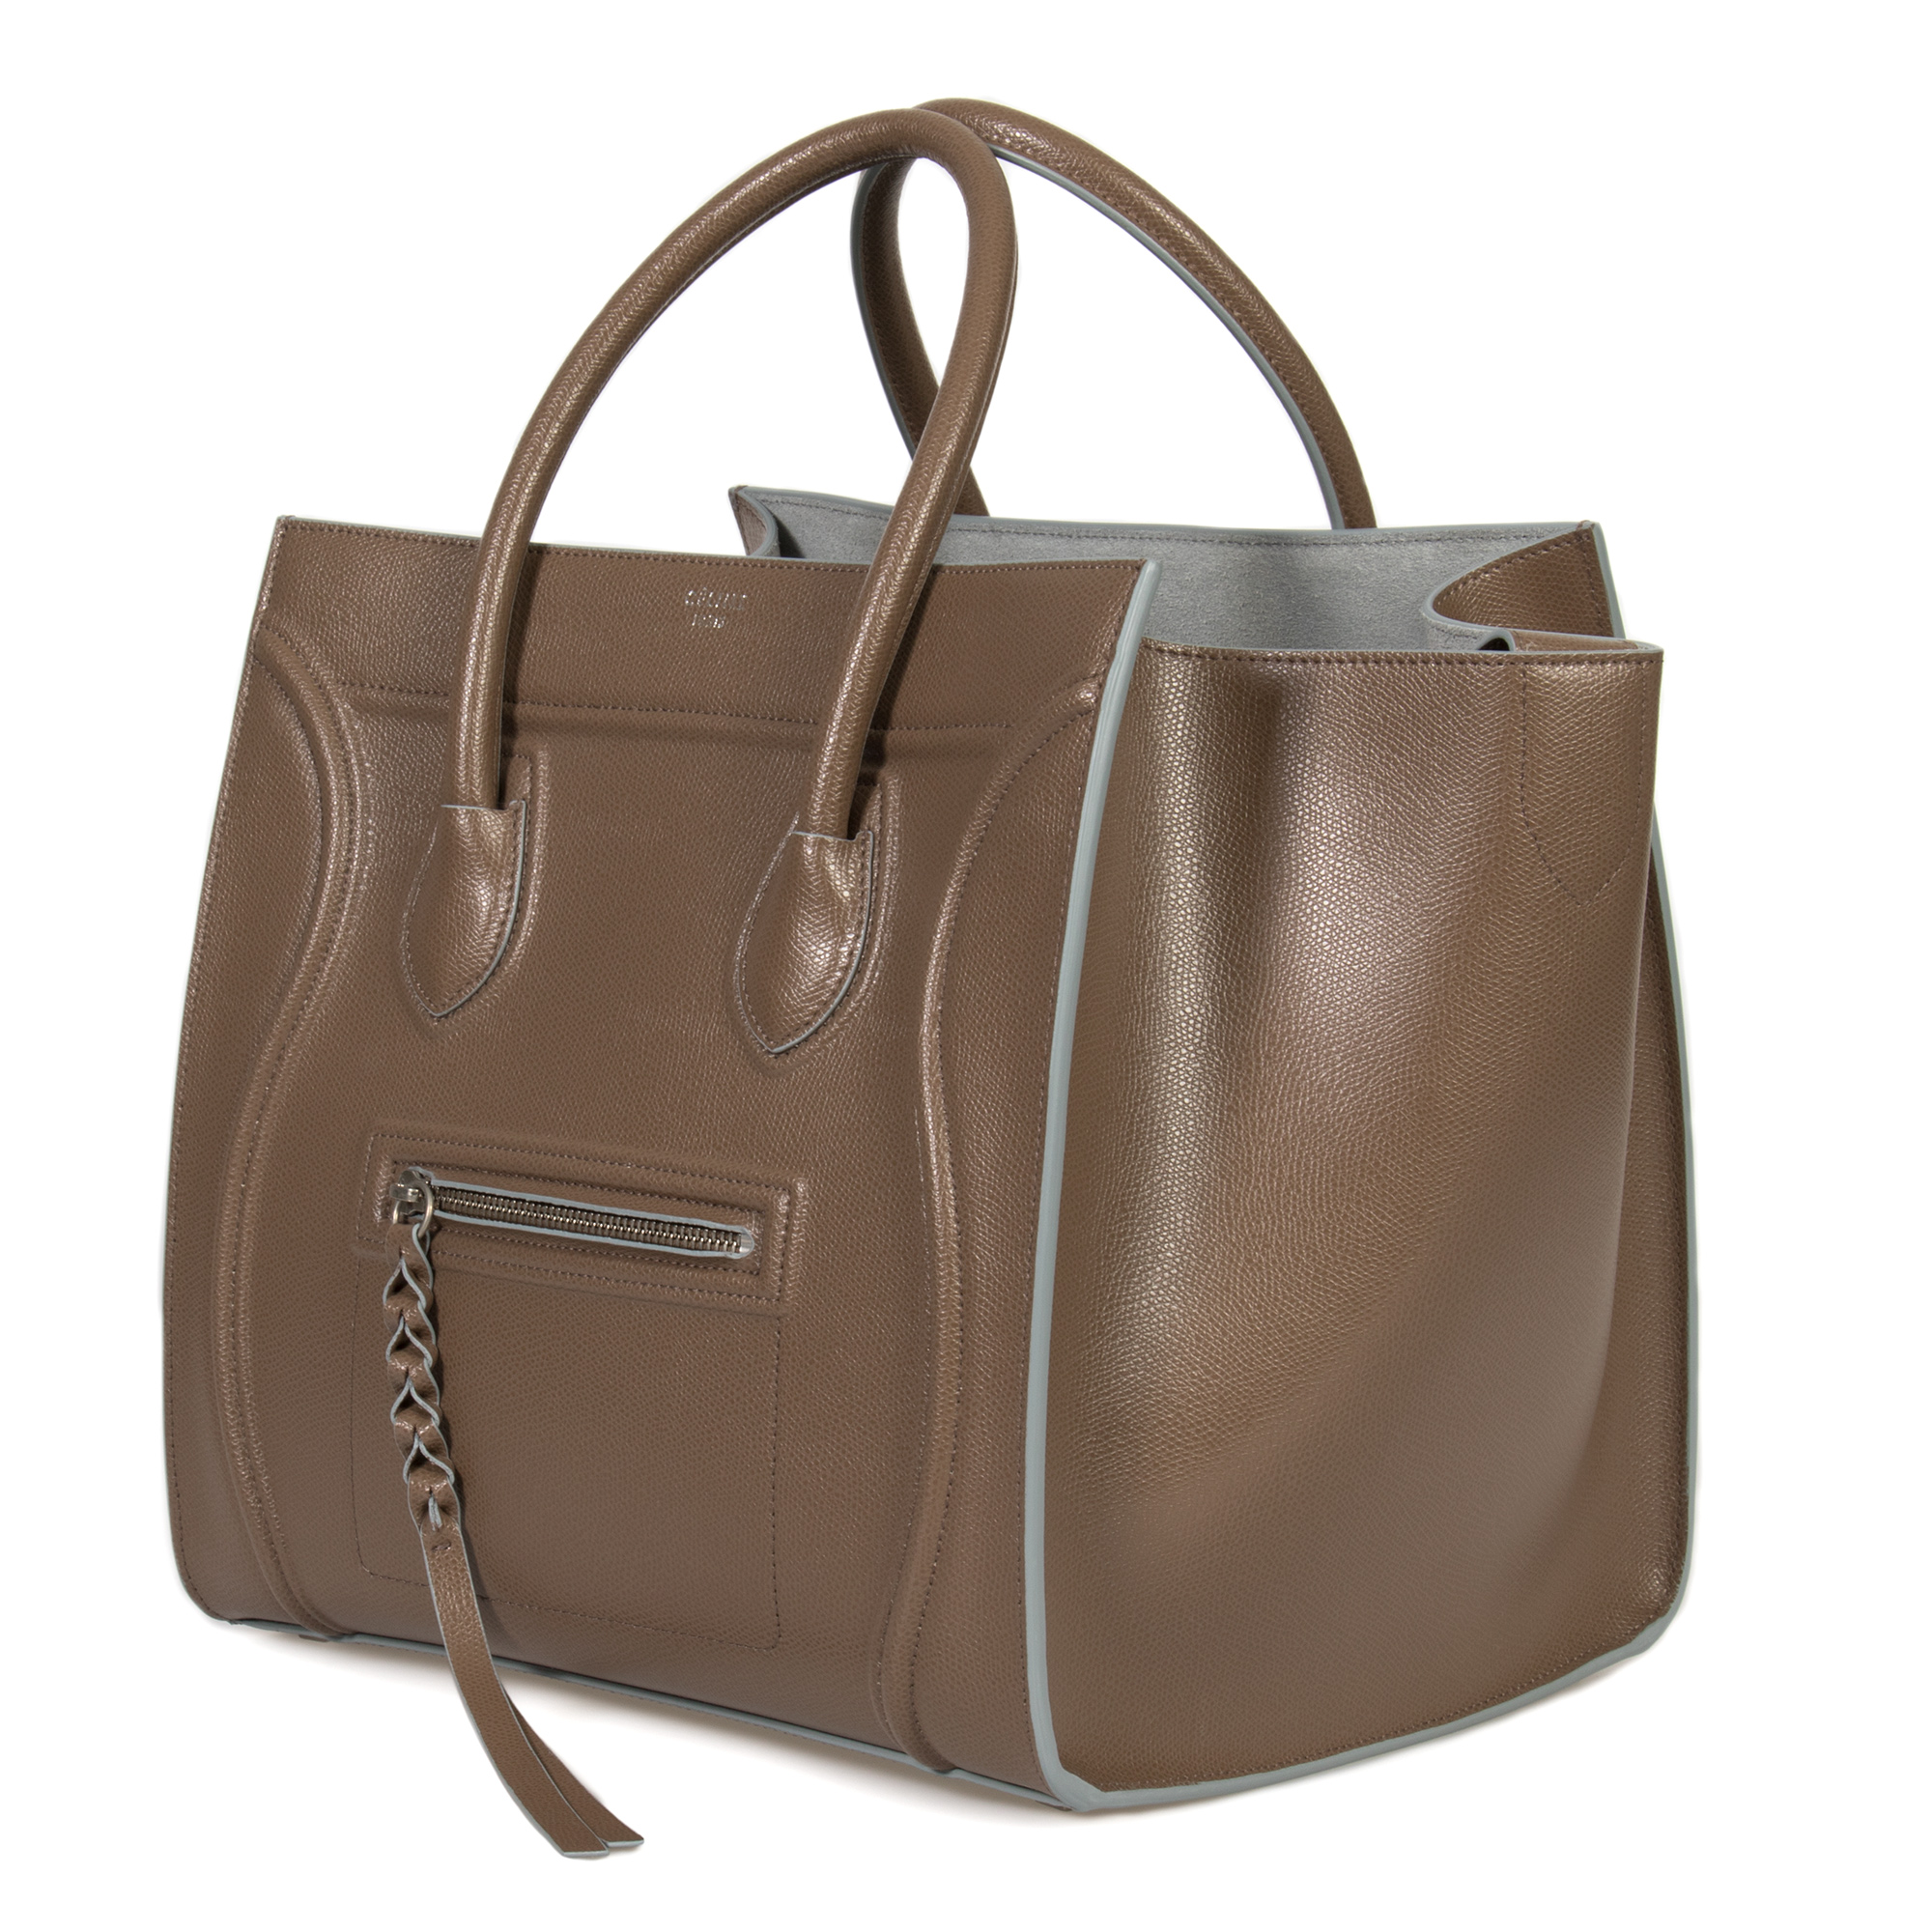 e041e5ac6a902 Celine Medium Luggage Phantom Bag In Taupe Baby Grained Calfskin Leather -  Walmart.com